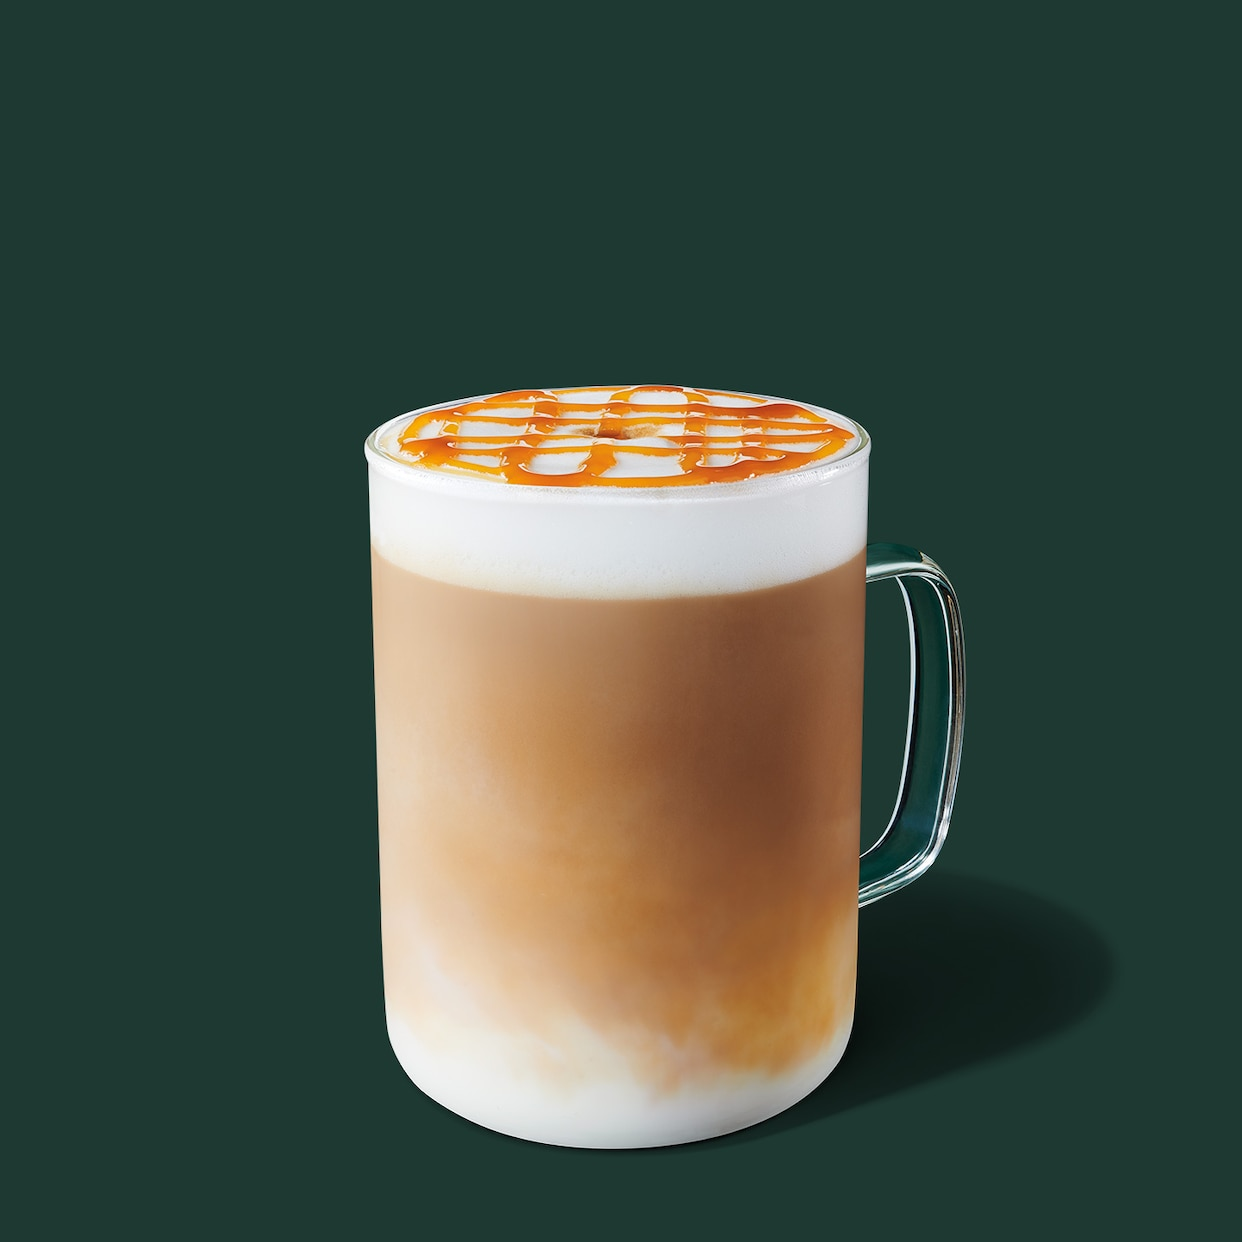 Caramel Macchiato: Starbucks Coffee Company